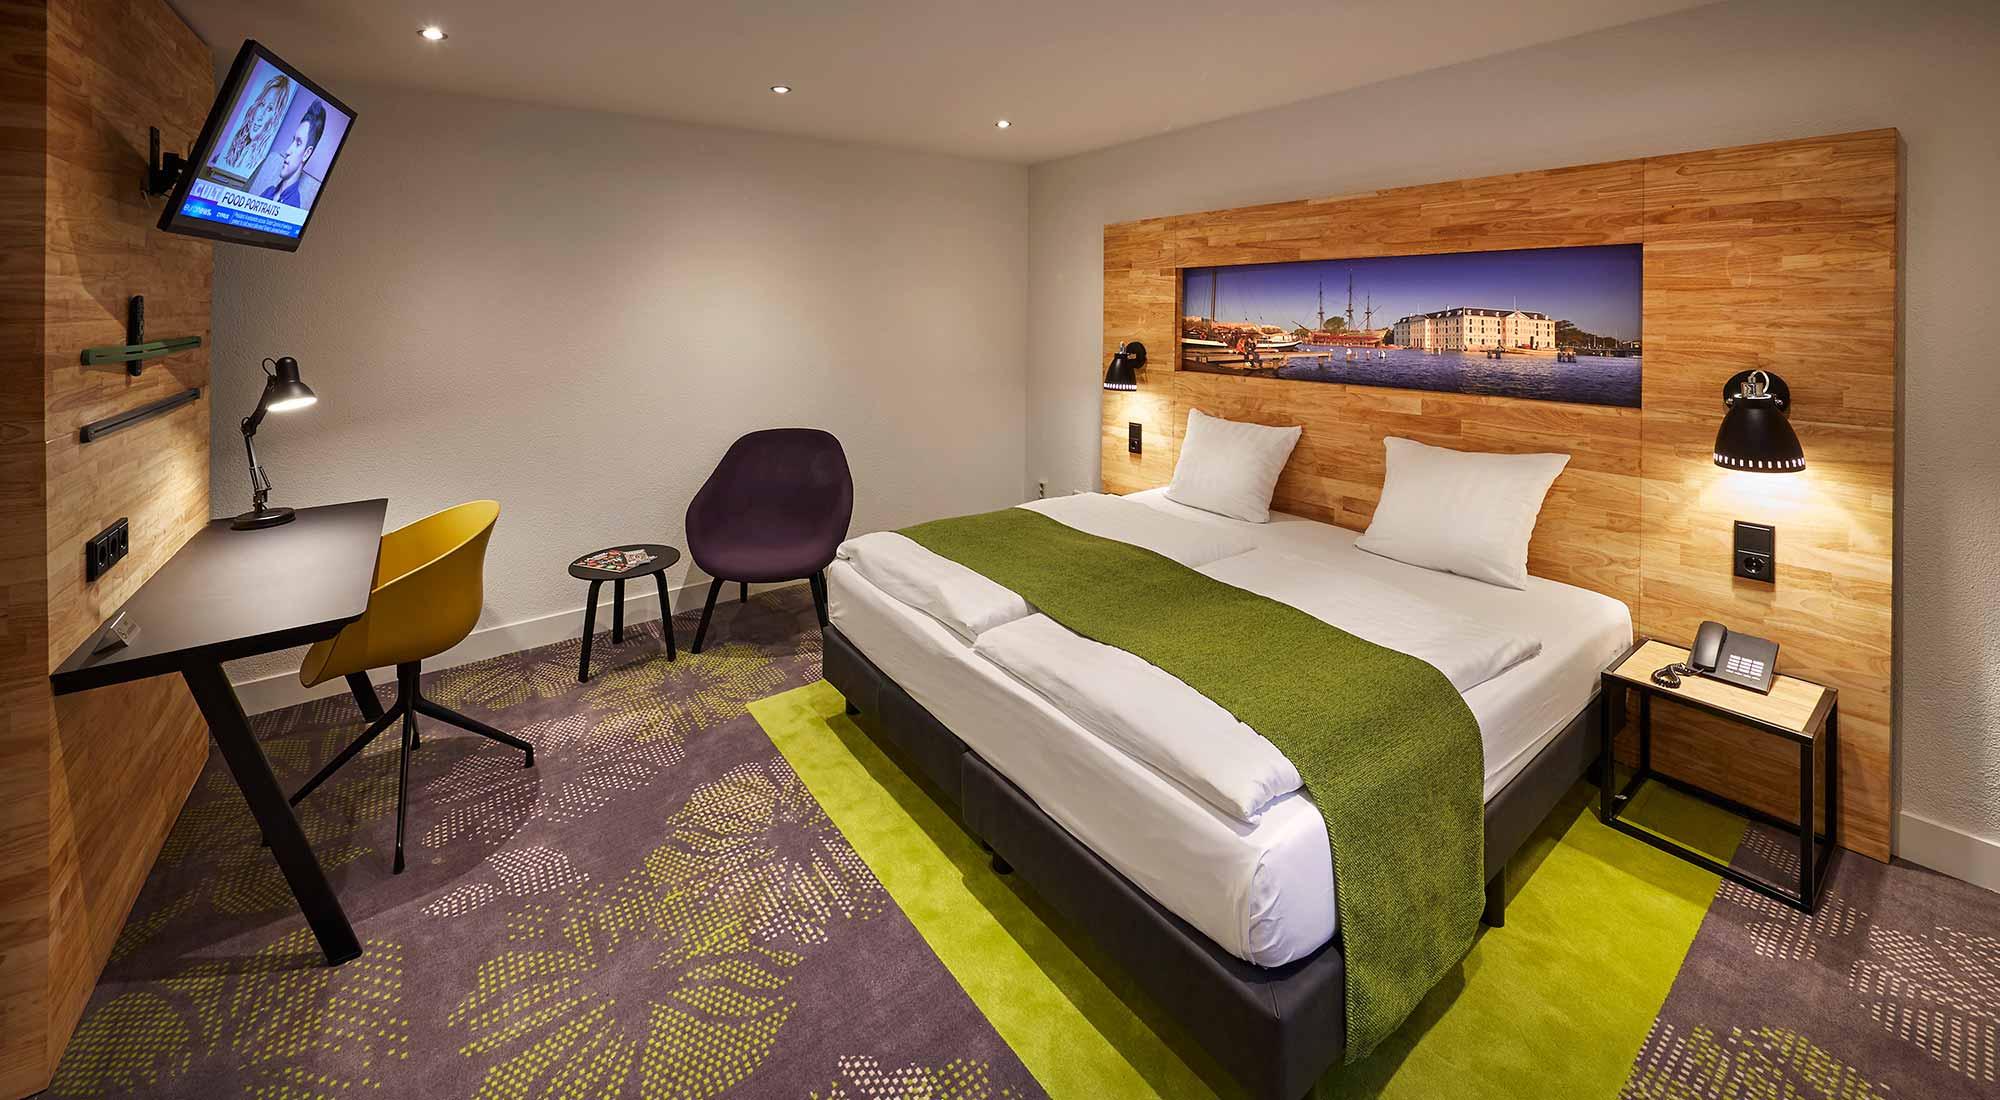 chambres nova hotel apartments h tel 3 toiles au coeur d 39 amsterdam. Black Bedroom Furniture Sets. Home Design Ideas